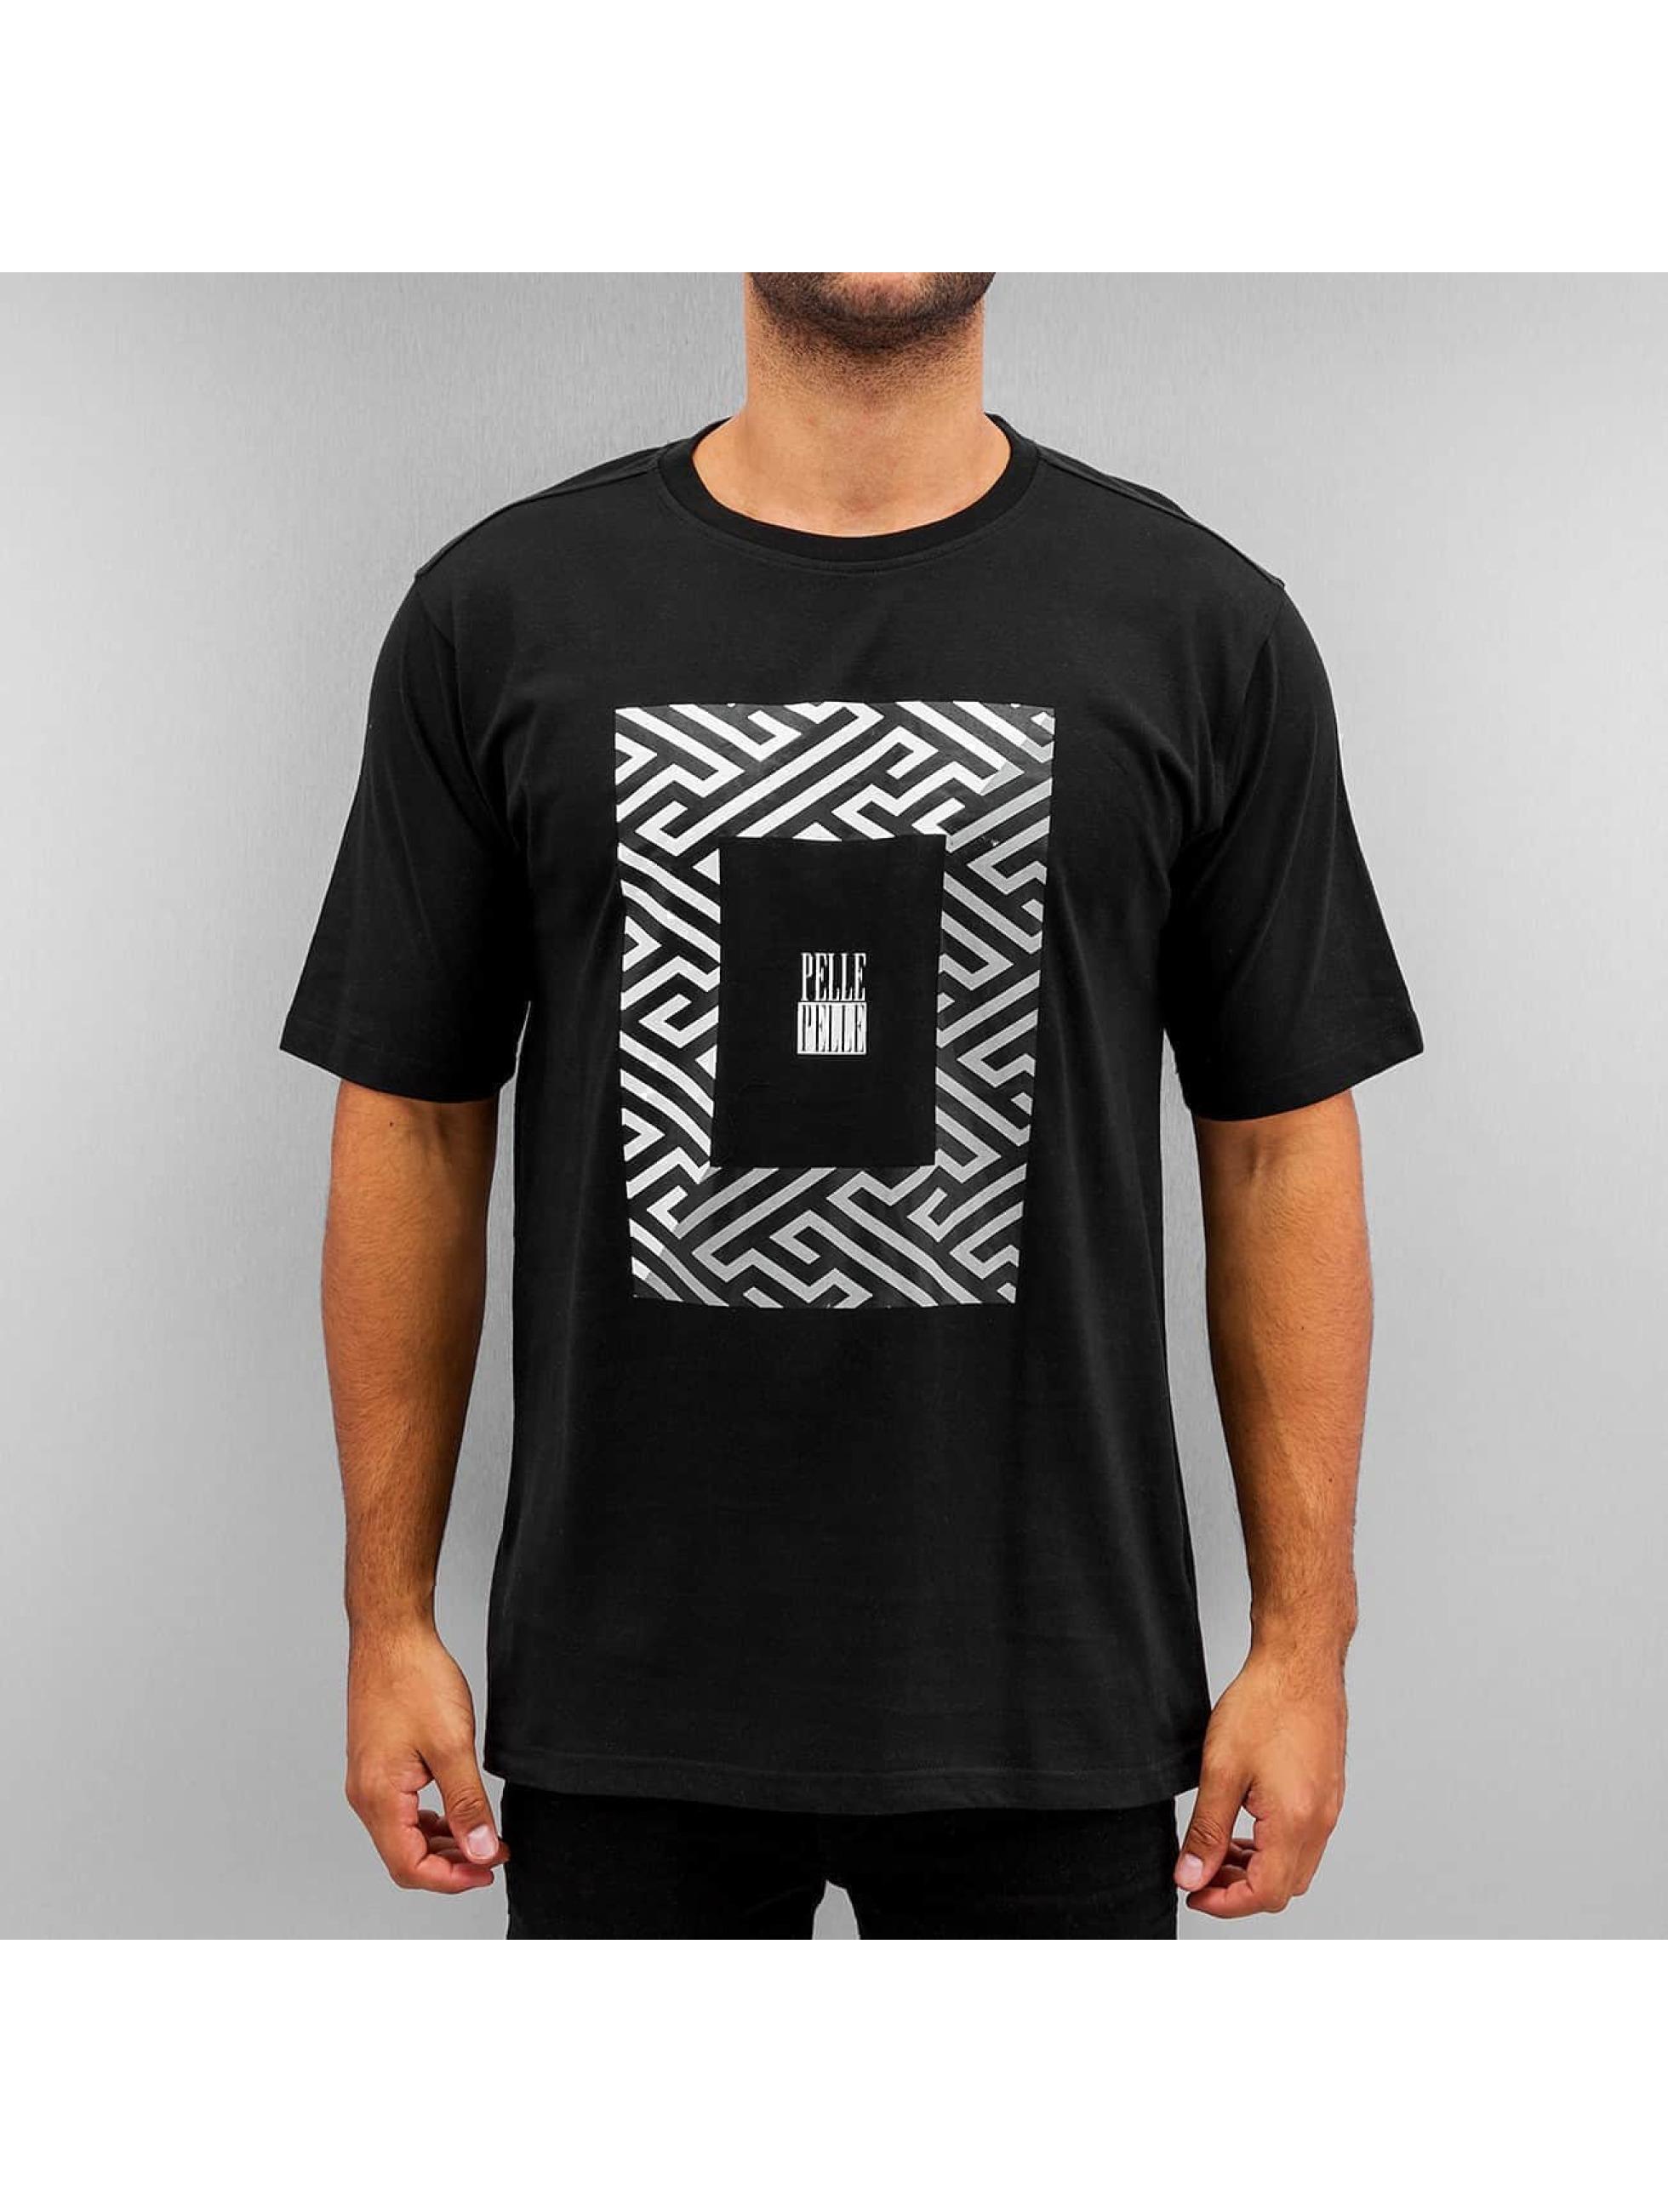 Pelle Pelle T-Shirt Dark Maze noir